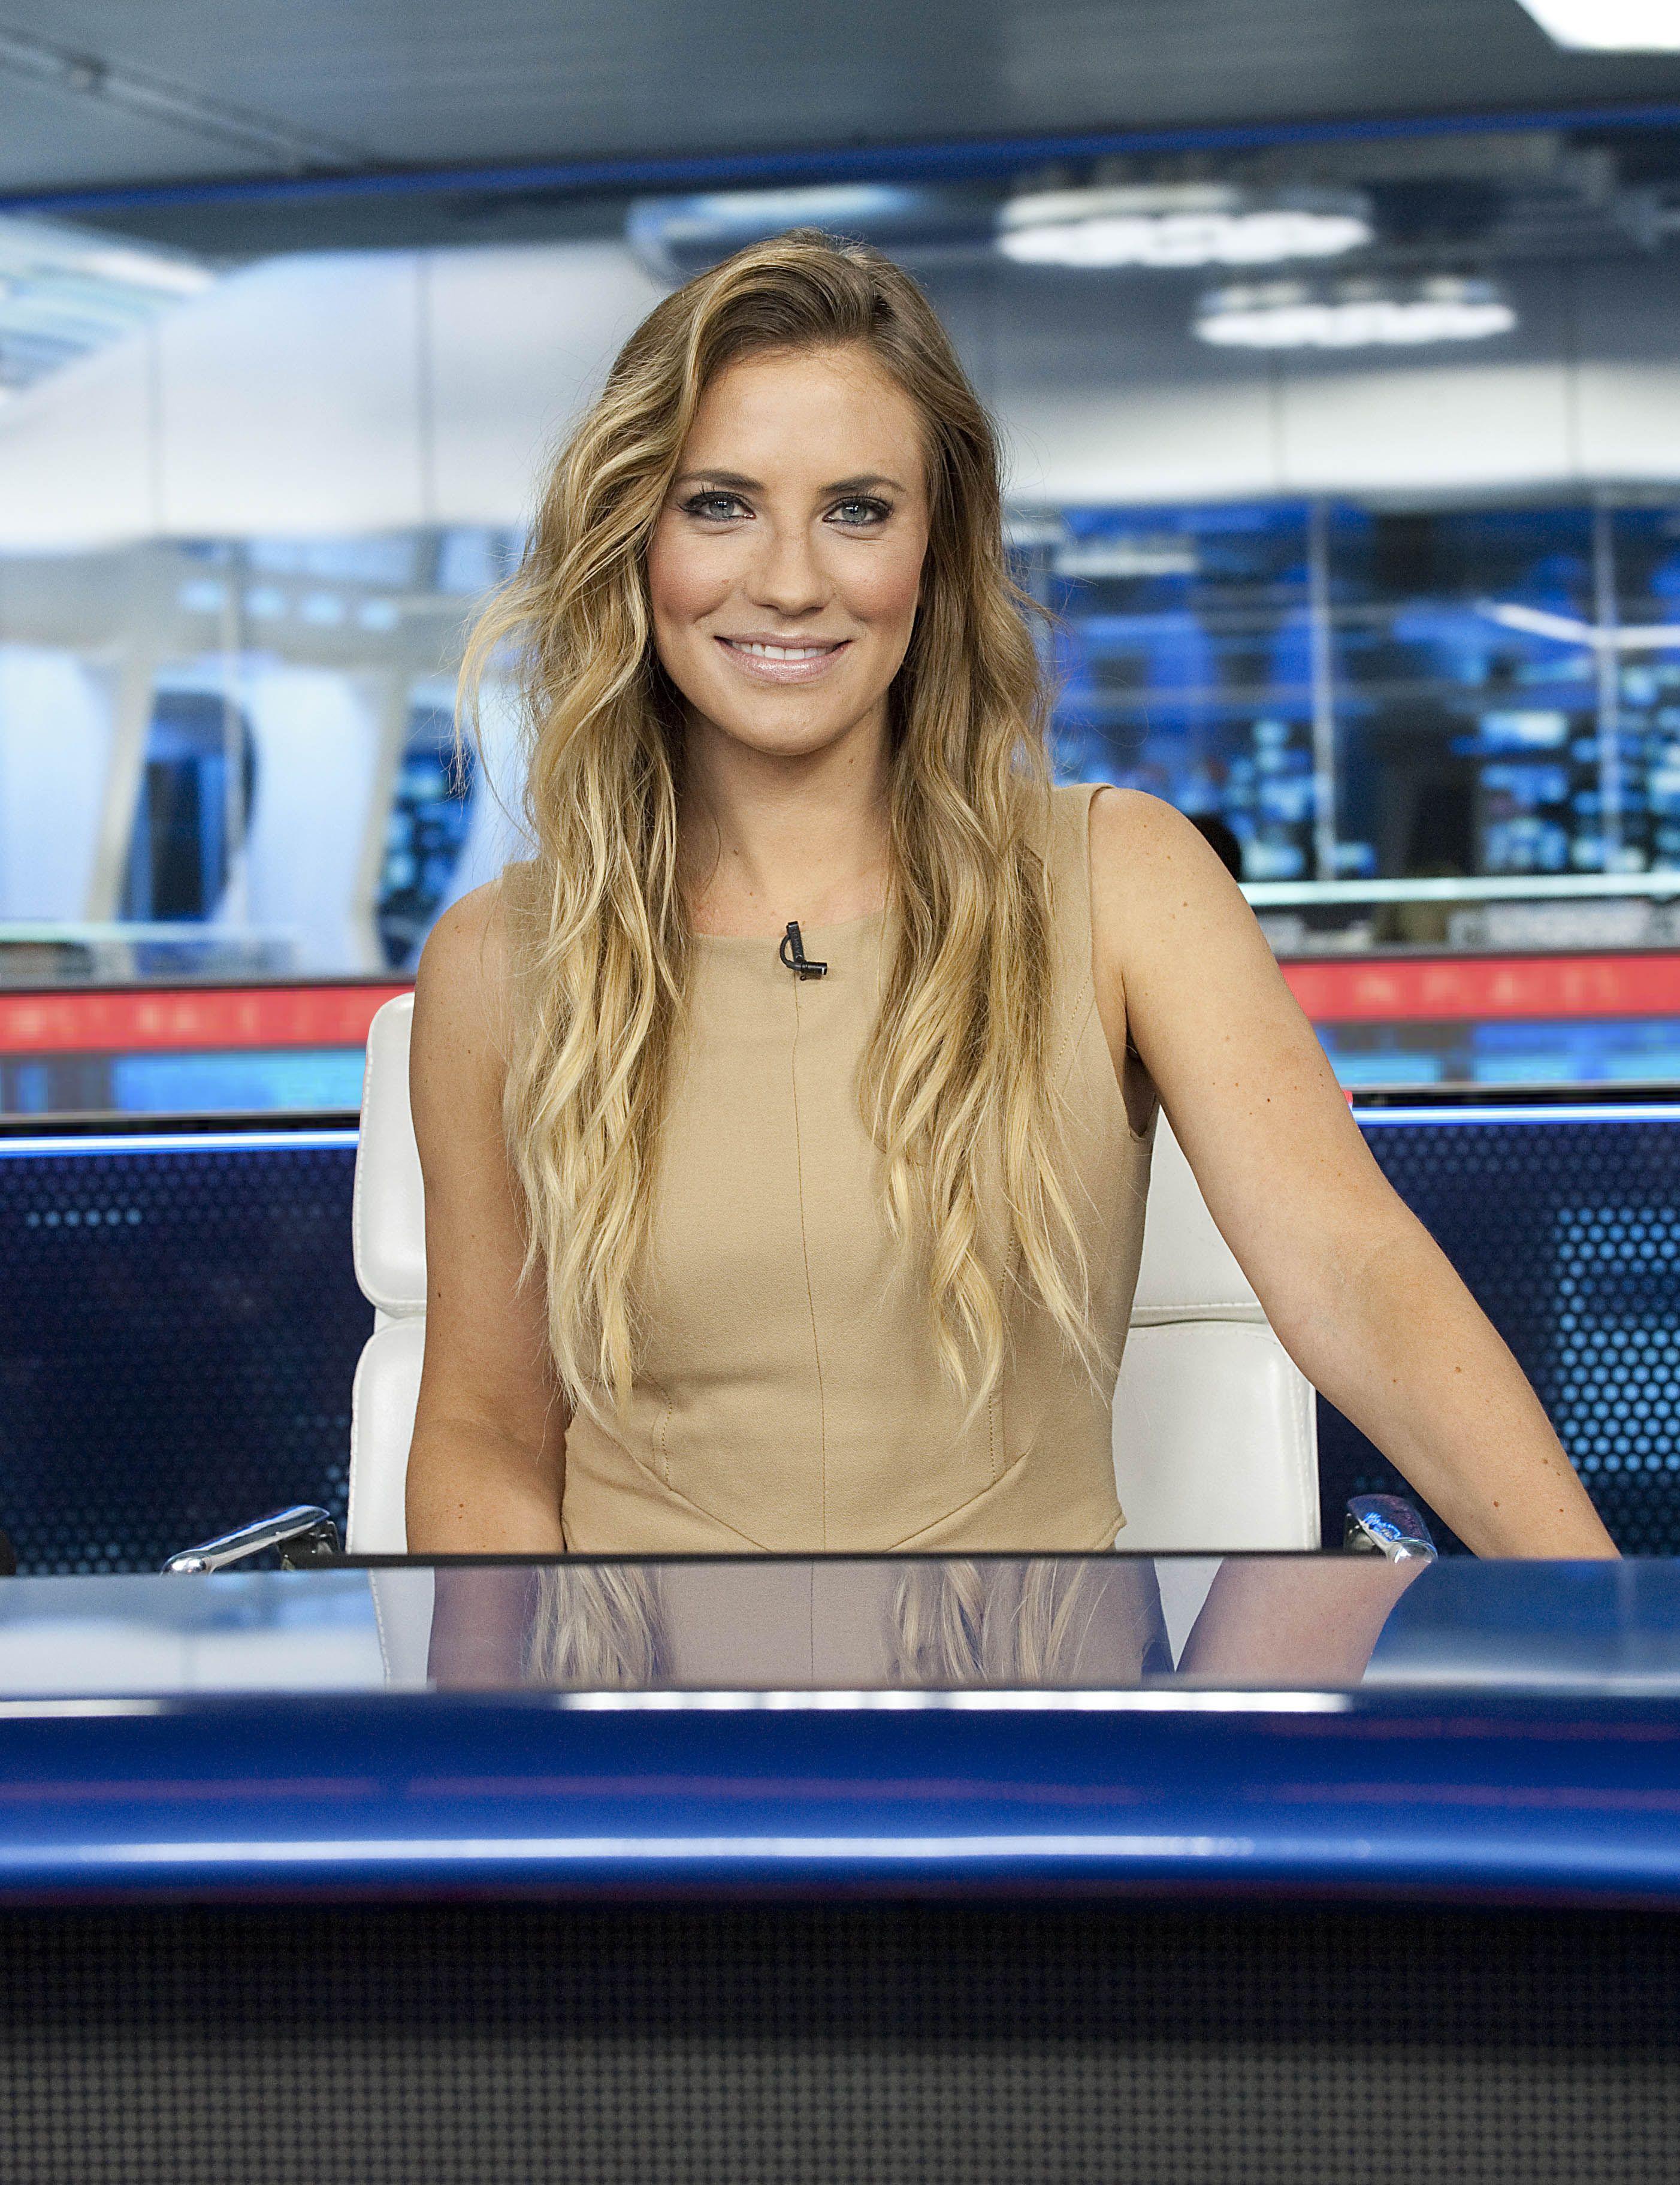 Sky Sports News Sky sports presenters, Sports makeup